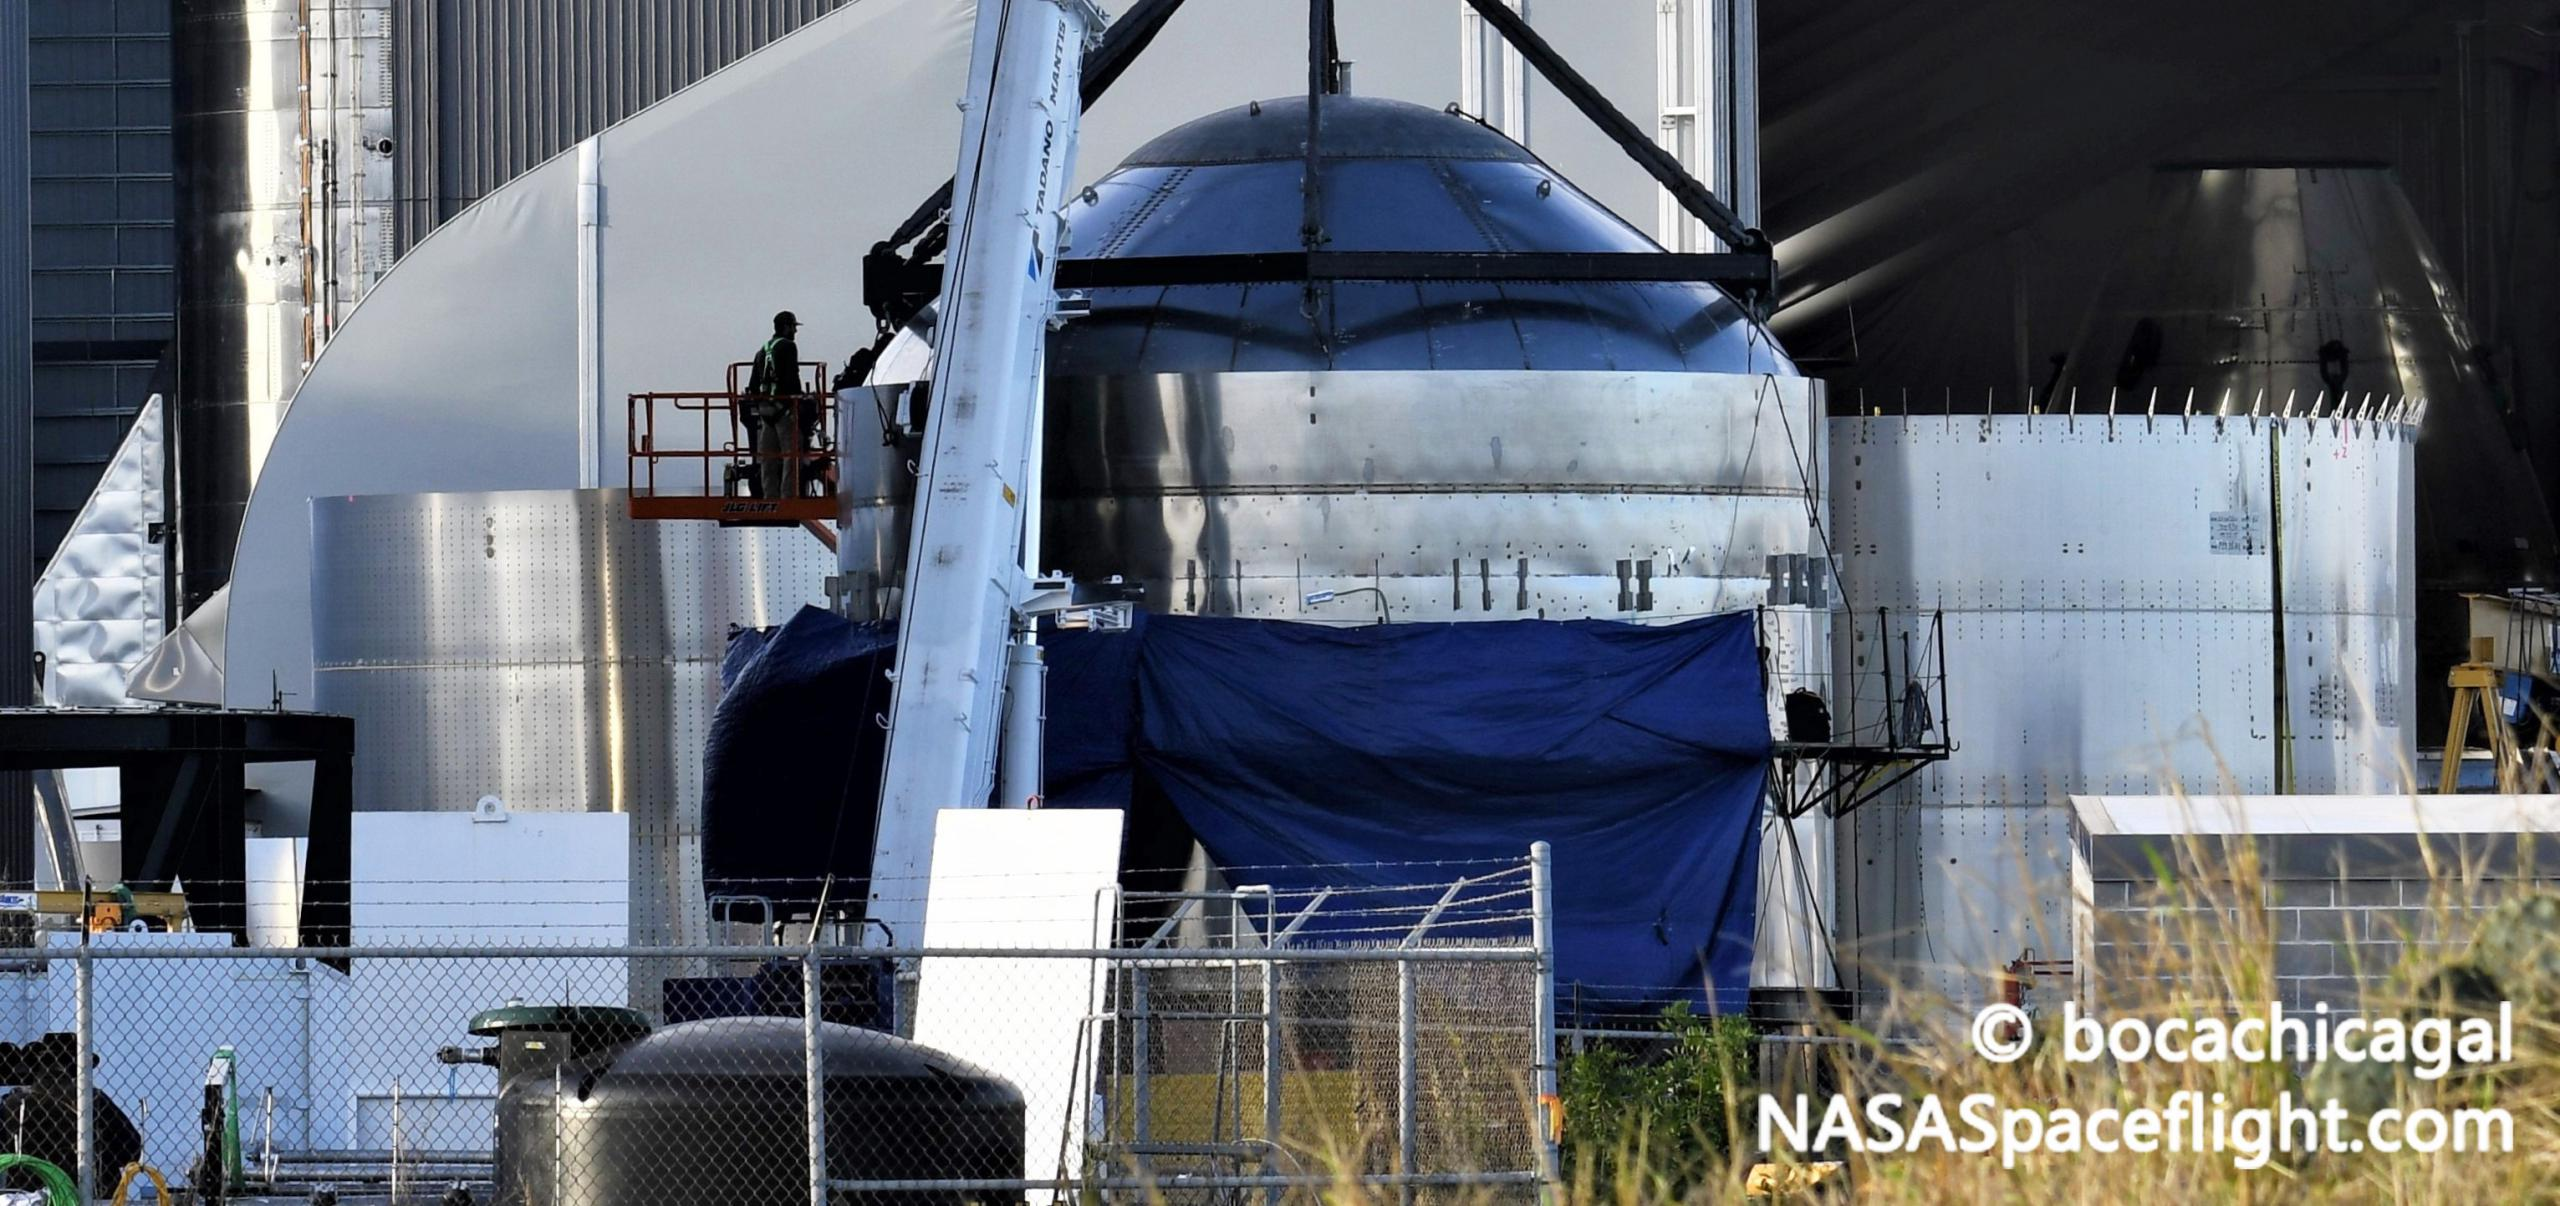 Starship Boca Chica 011321 (NASASpaceflight – bocachicagal) SN7.2 work + SN10 2 crop (c)